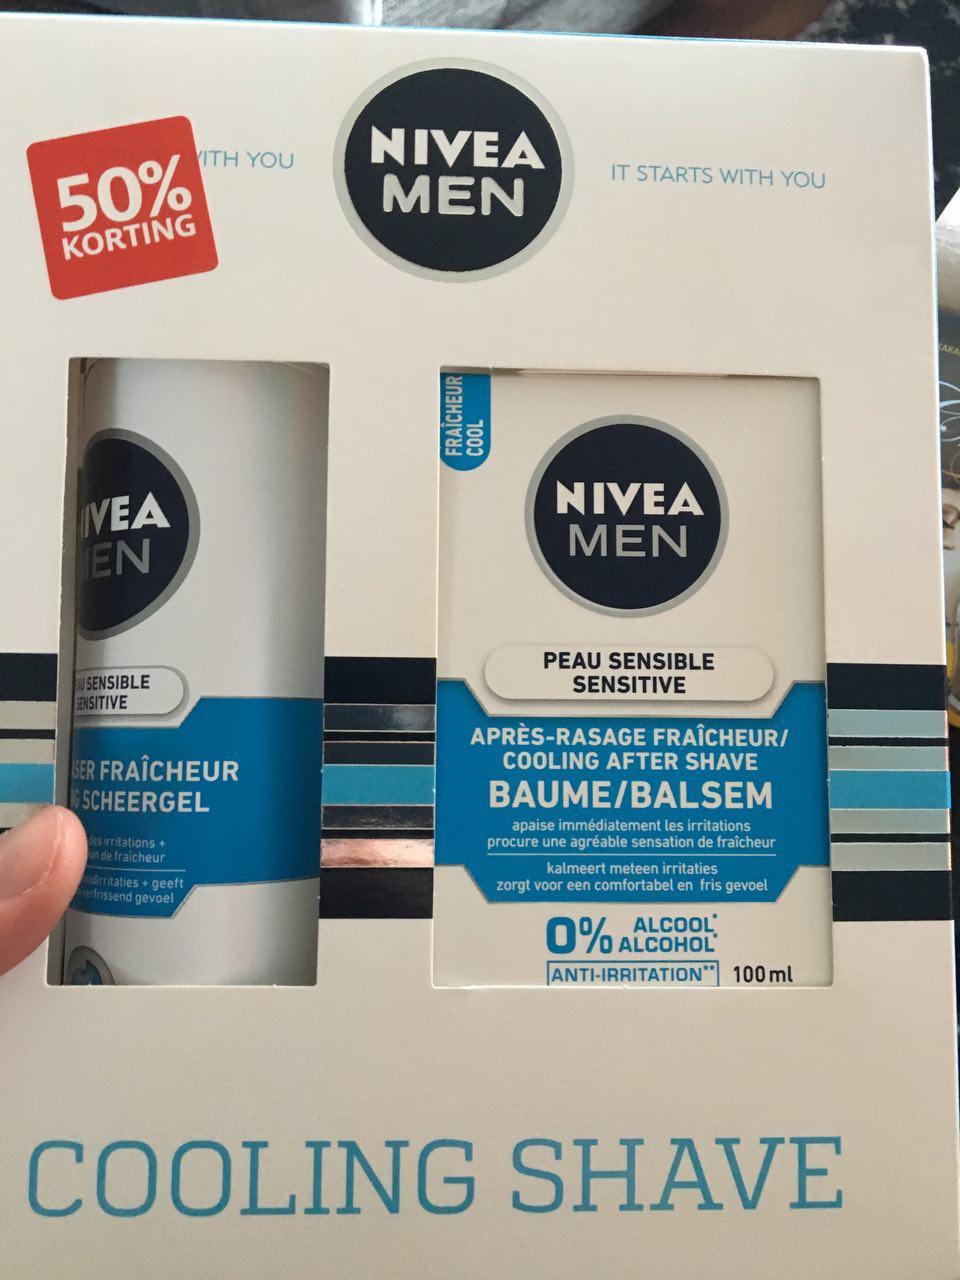 Nivea Men Cooling Shave geschenkset Etos €5,00